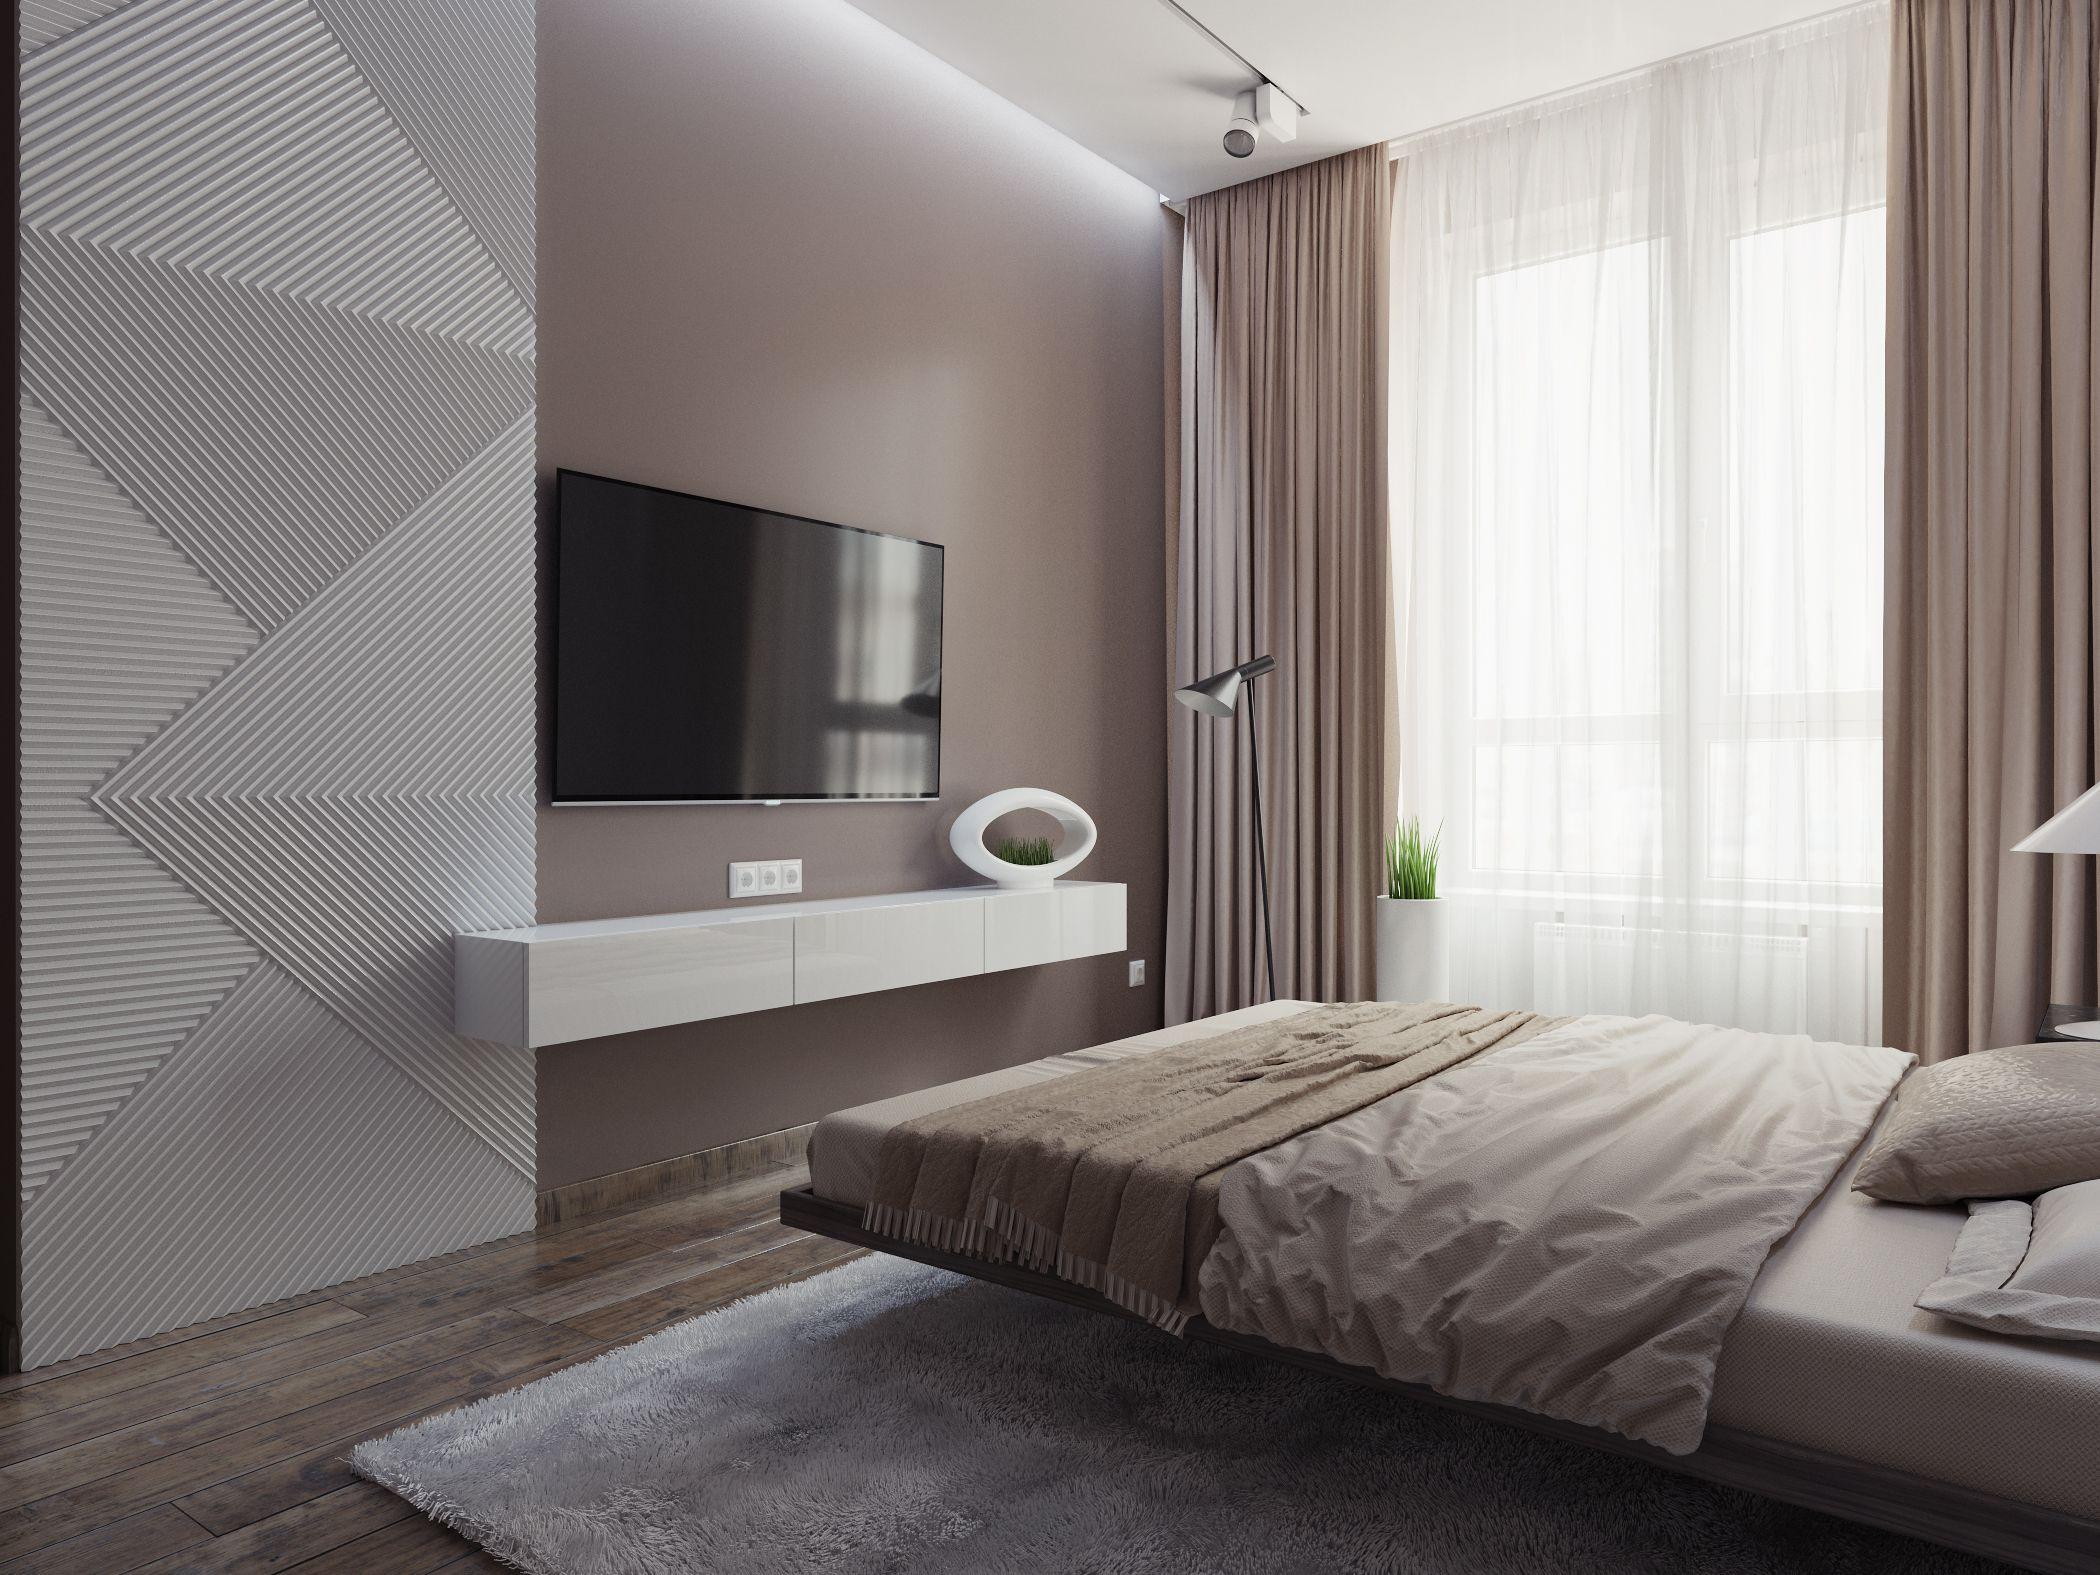 3ddd Ru New House  # Muebles Viu Recamaras